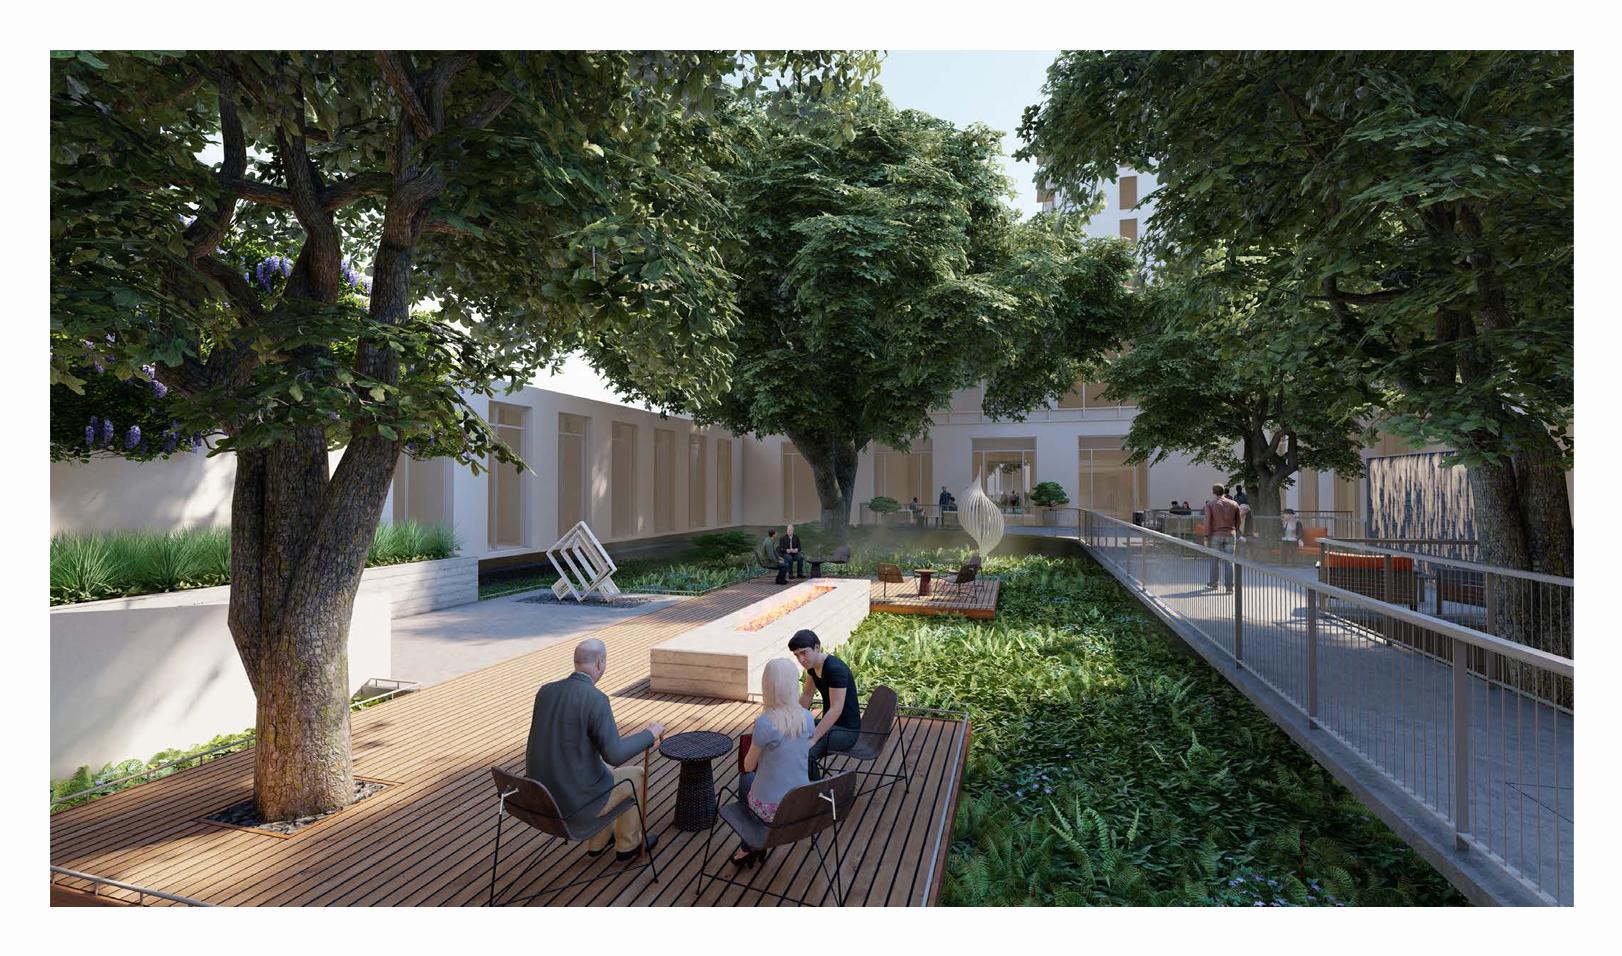 04_Big-Al-Courtyard-2.png